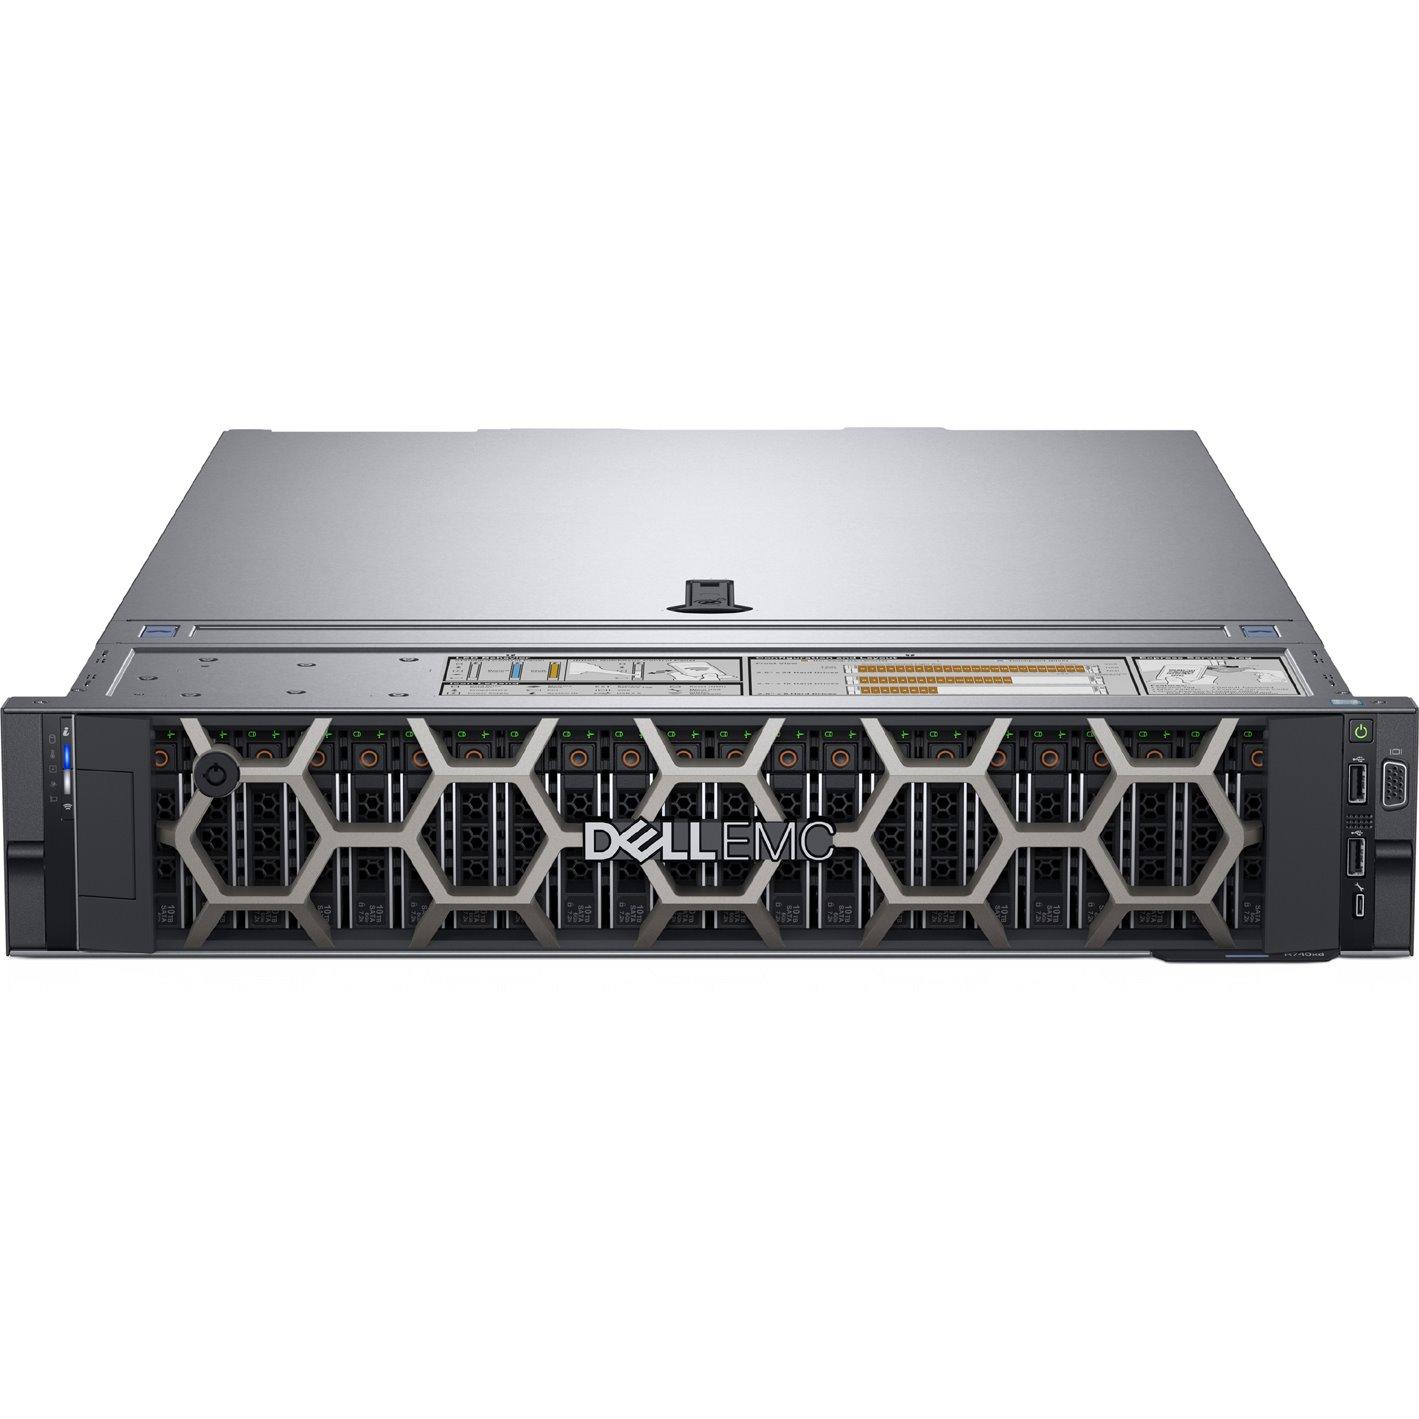 Dell EMC PowerEdge R740 2U Rack Server - 1 x Intel Xeon Silver 4210 2.20 GHz - 16 GB RAM - 2.40 TB (2 x 1.20 TB) HDD - 12Gb/s SAS, Serial ATA/600 Controller